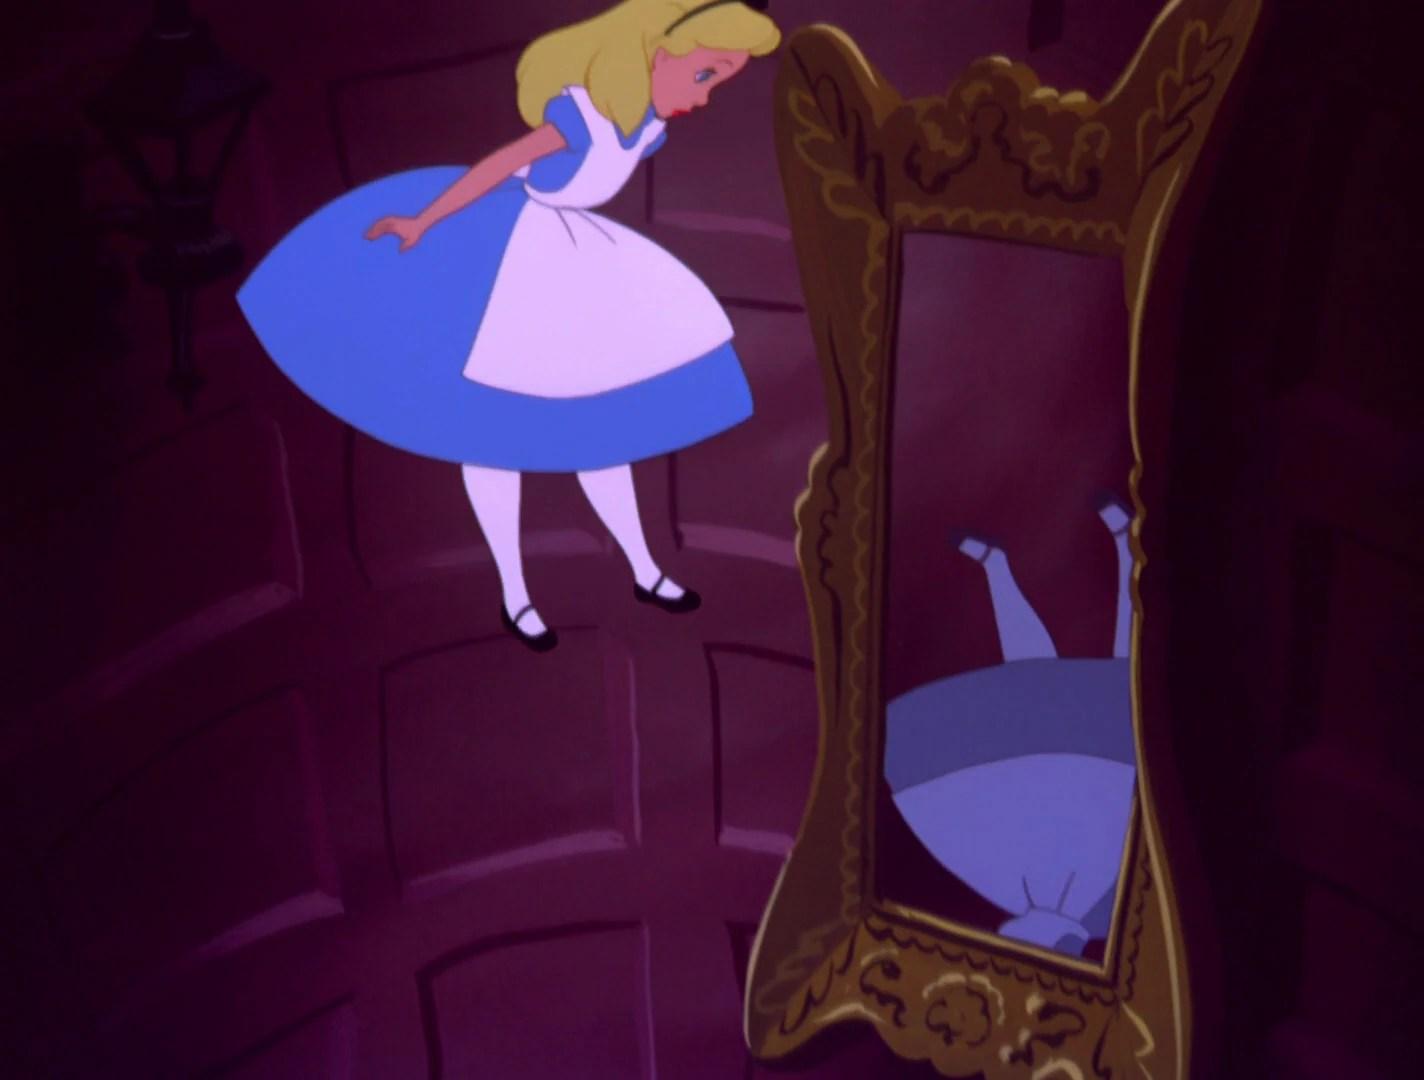 Alice Parachute Dress Deviantart: Down The Rabbit Hole Alice Parachute Dress